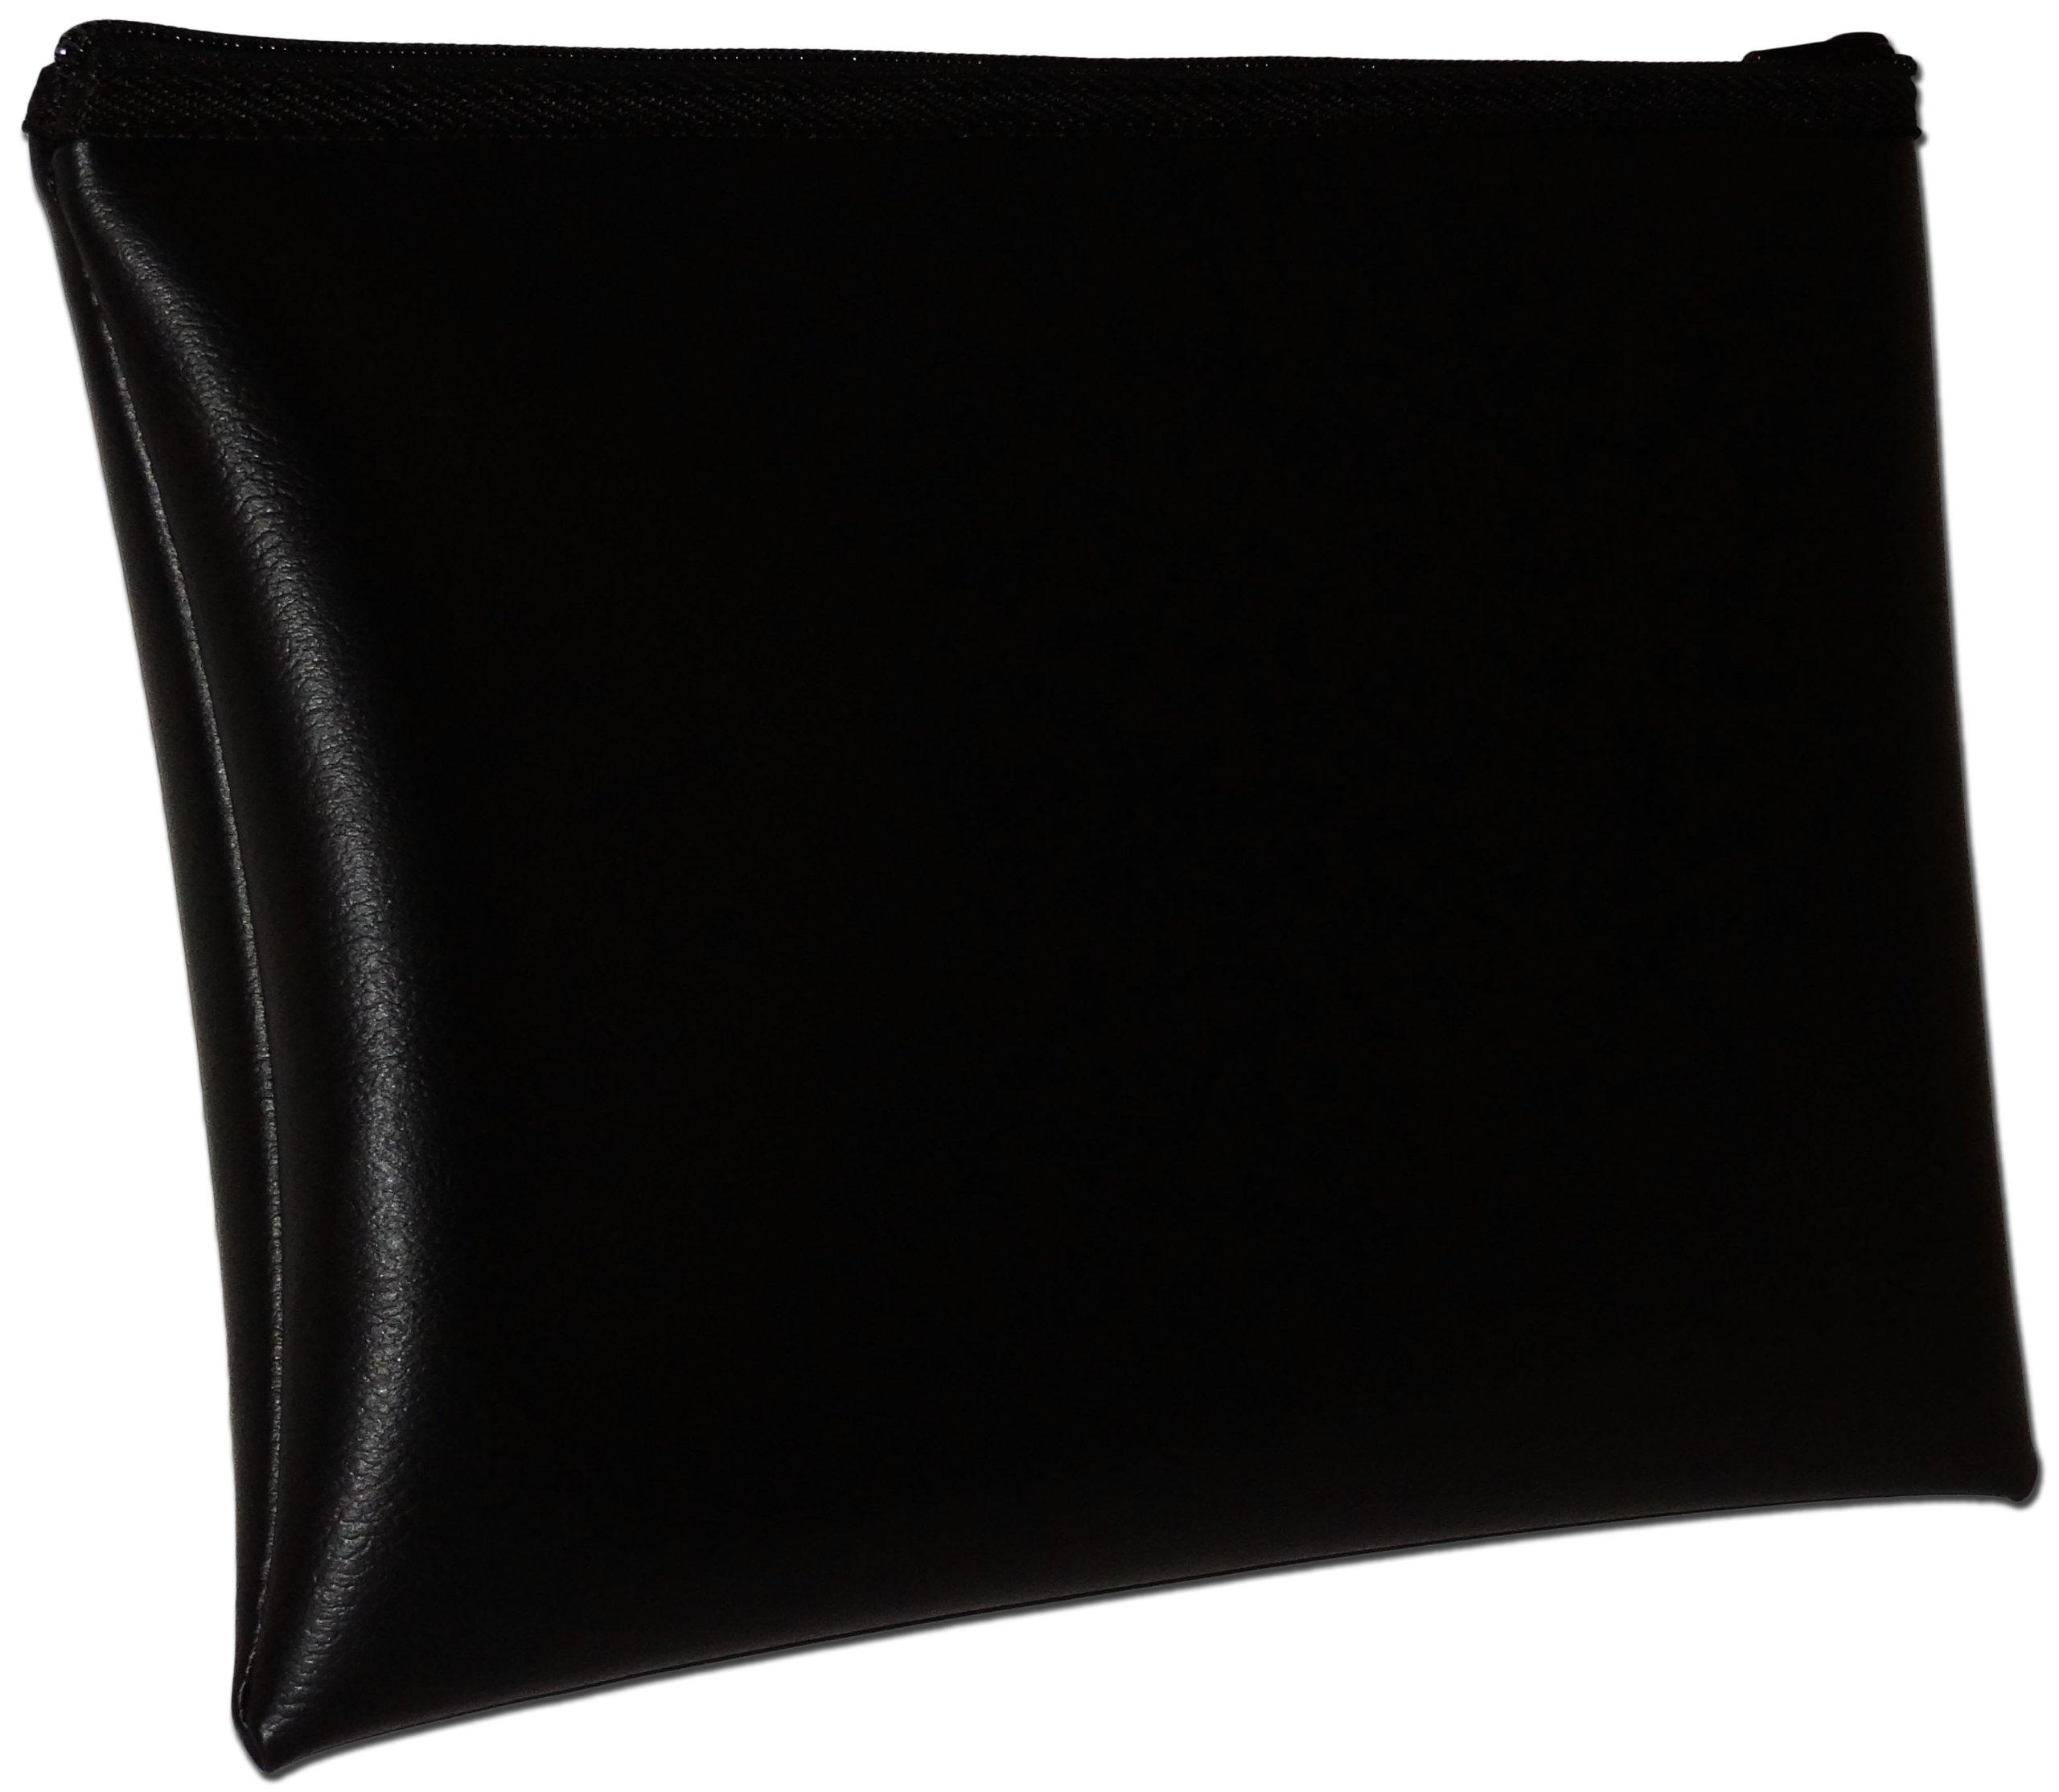 MDM Security Bank Deposit / Utility Zipper, Coin Bag, 16x12 Inches/Black Money Bag.